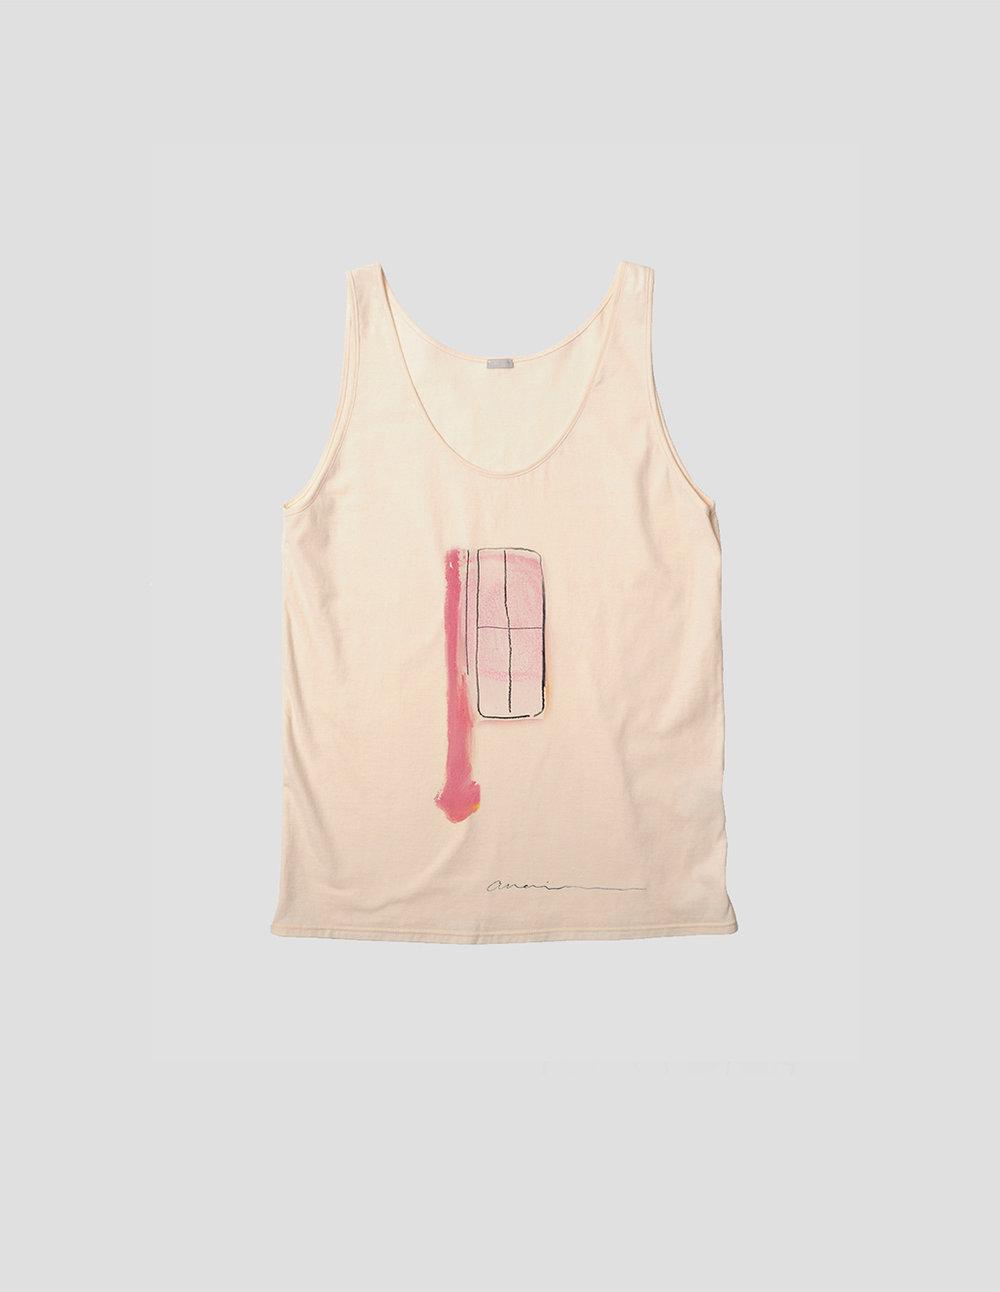 pink shirt window.jpg